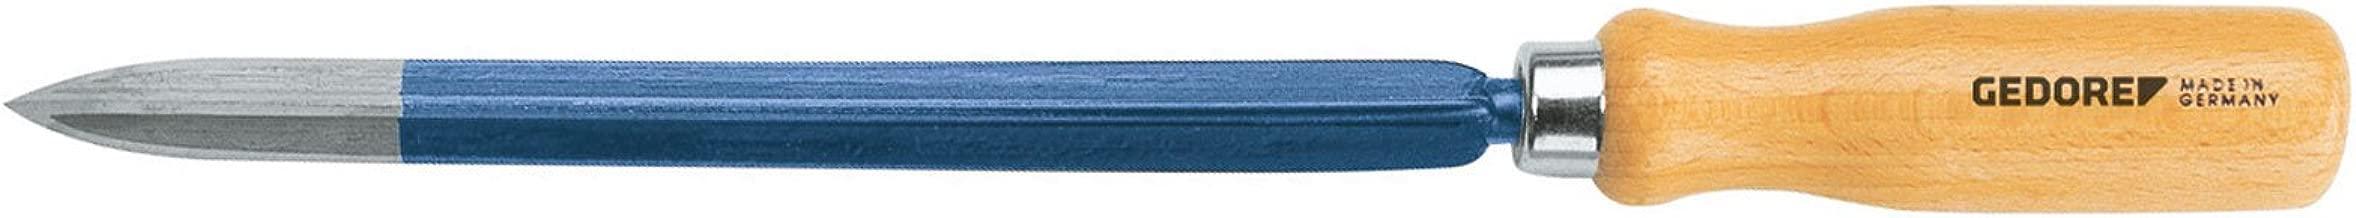 Gedore Concave 三角刮刀 250 毫米 - 132-250